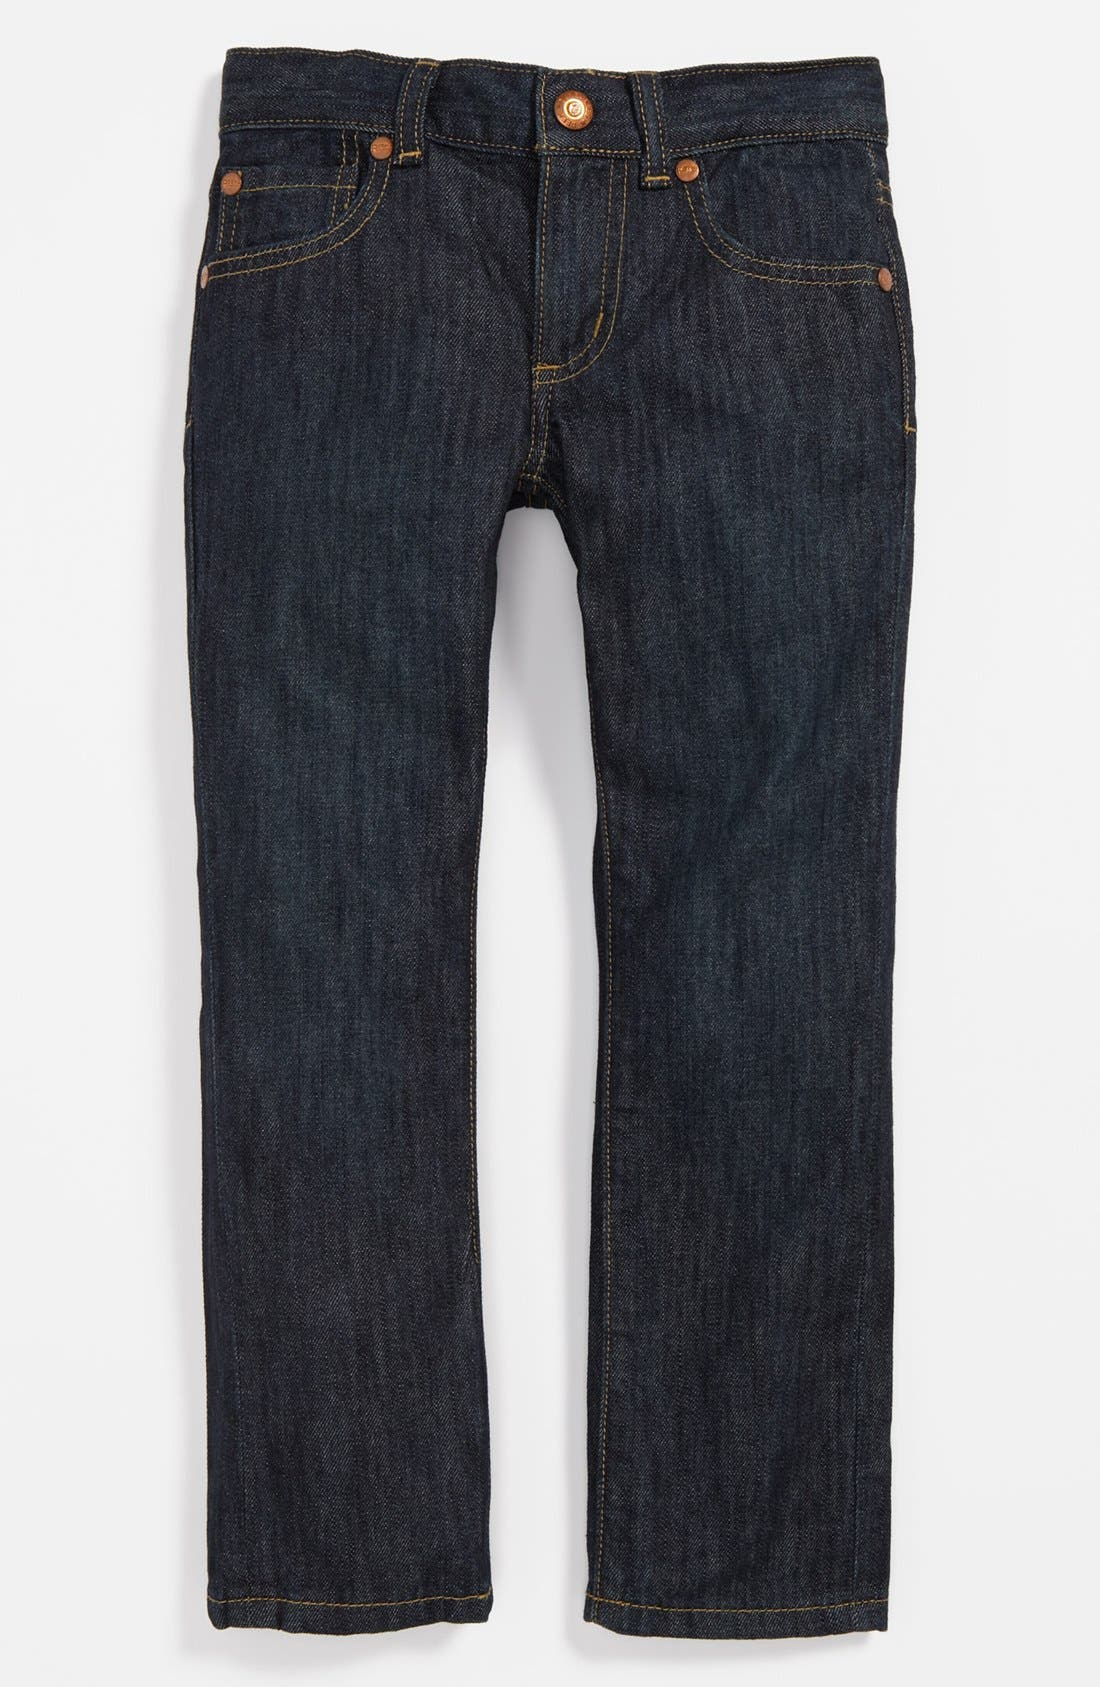 Alternate Image 2  - Peek 'Slouch' Jeans (Toddler Boys, Little Boys & Big Boys)